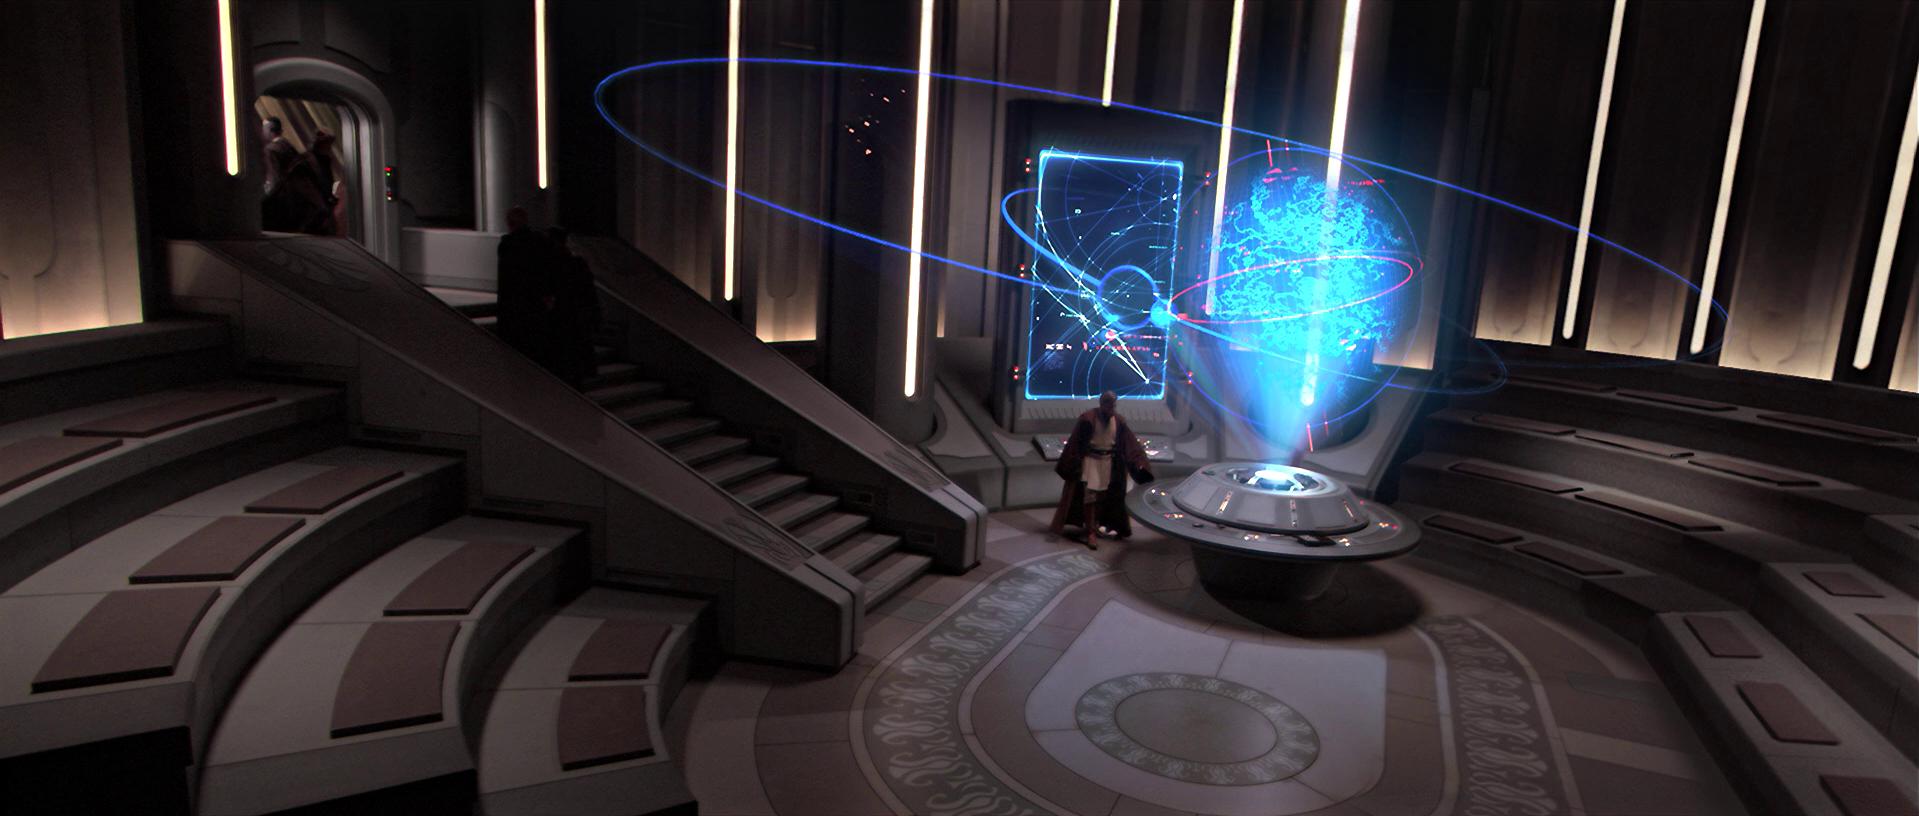 Jedi Temple communication center/Legends